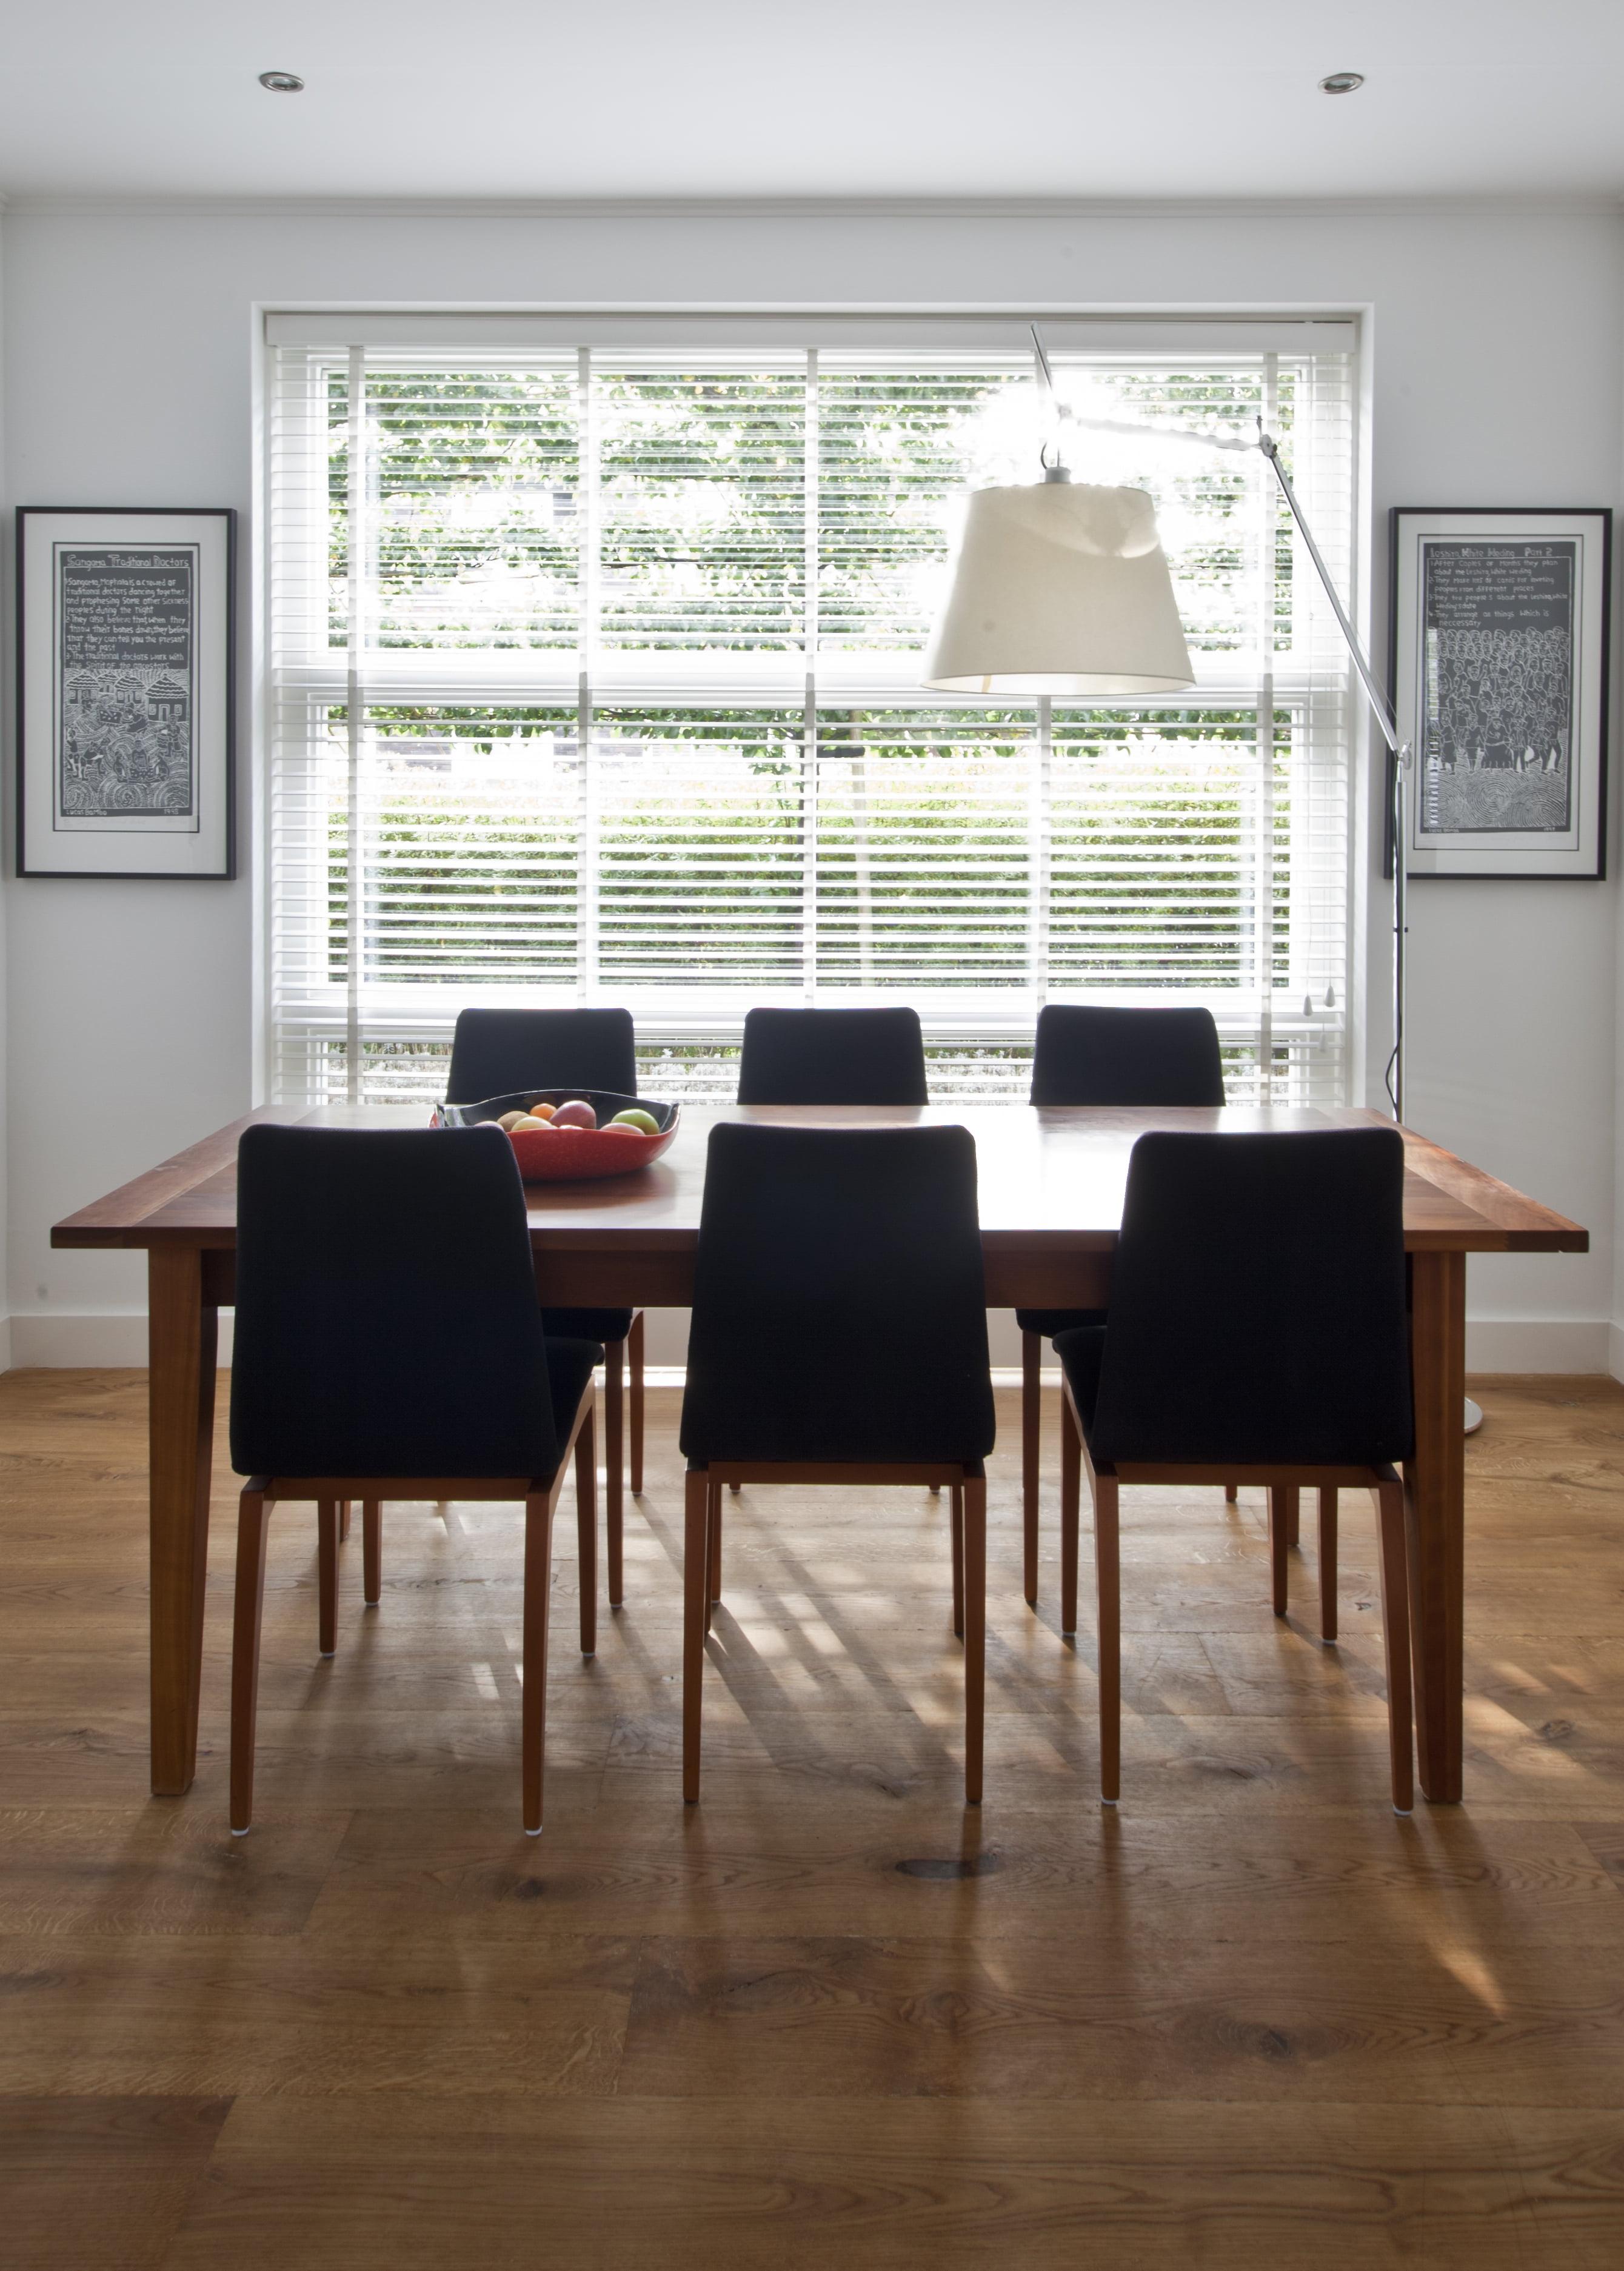 Leggen van Lamel en Duo plank - Vloerenbedrijf Bezema